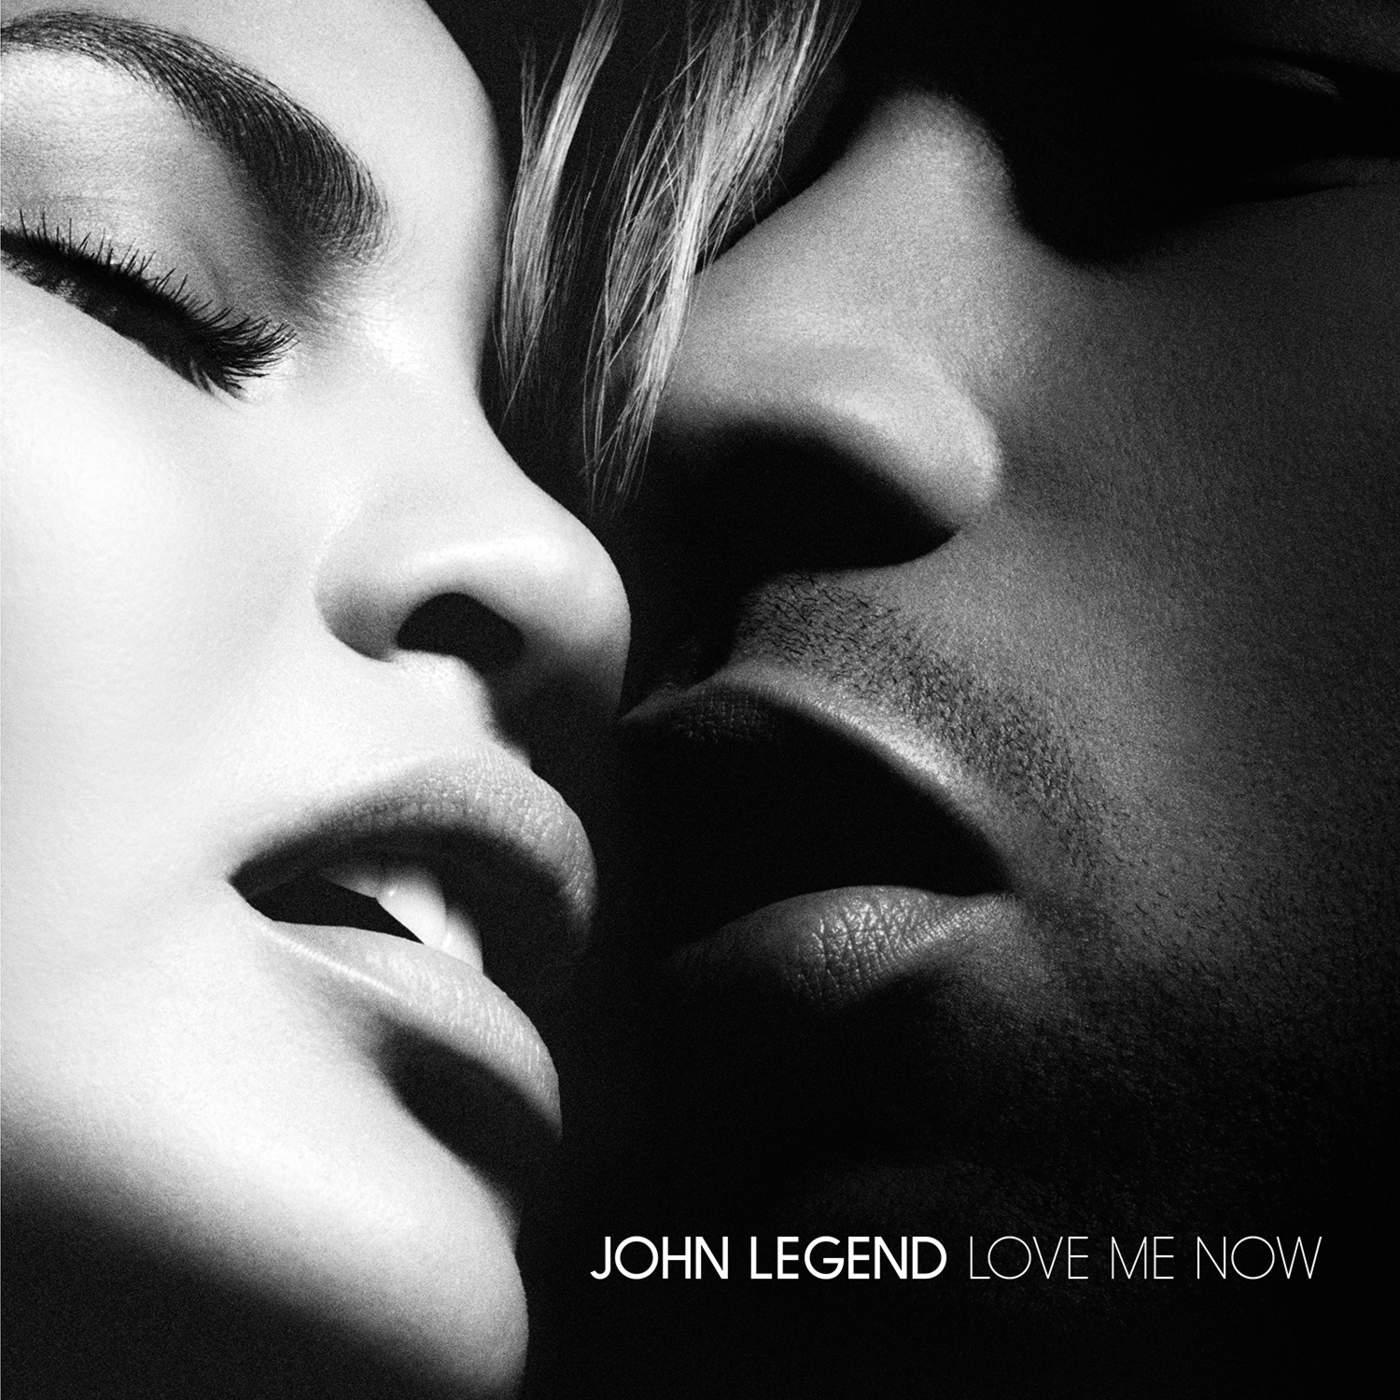 John Legend - Love Me Now - Single Cover